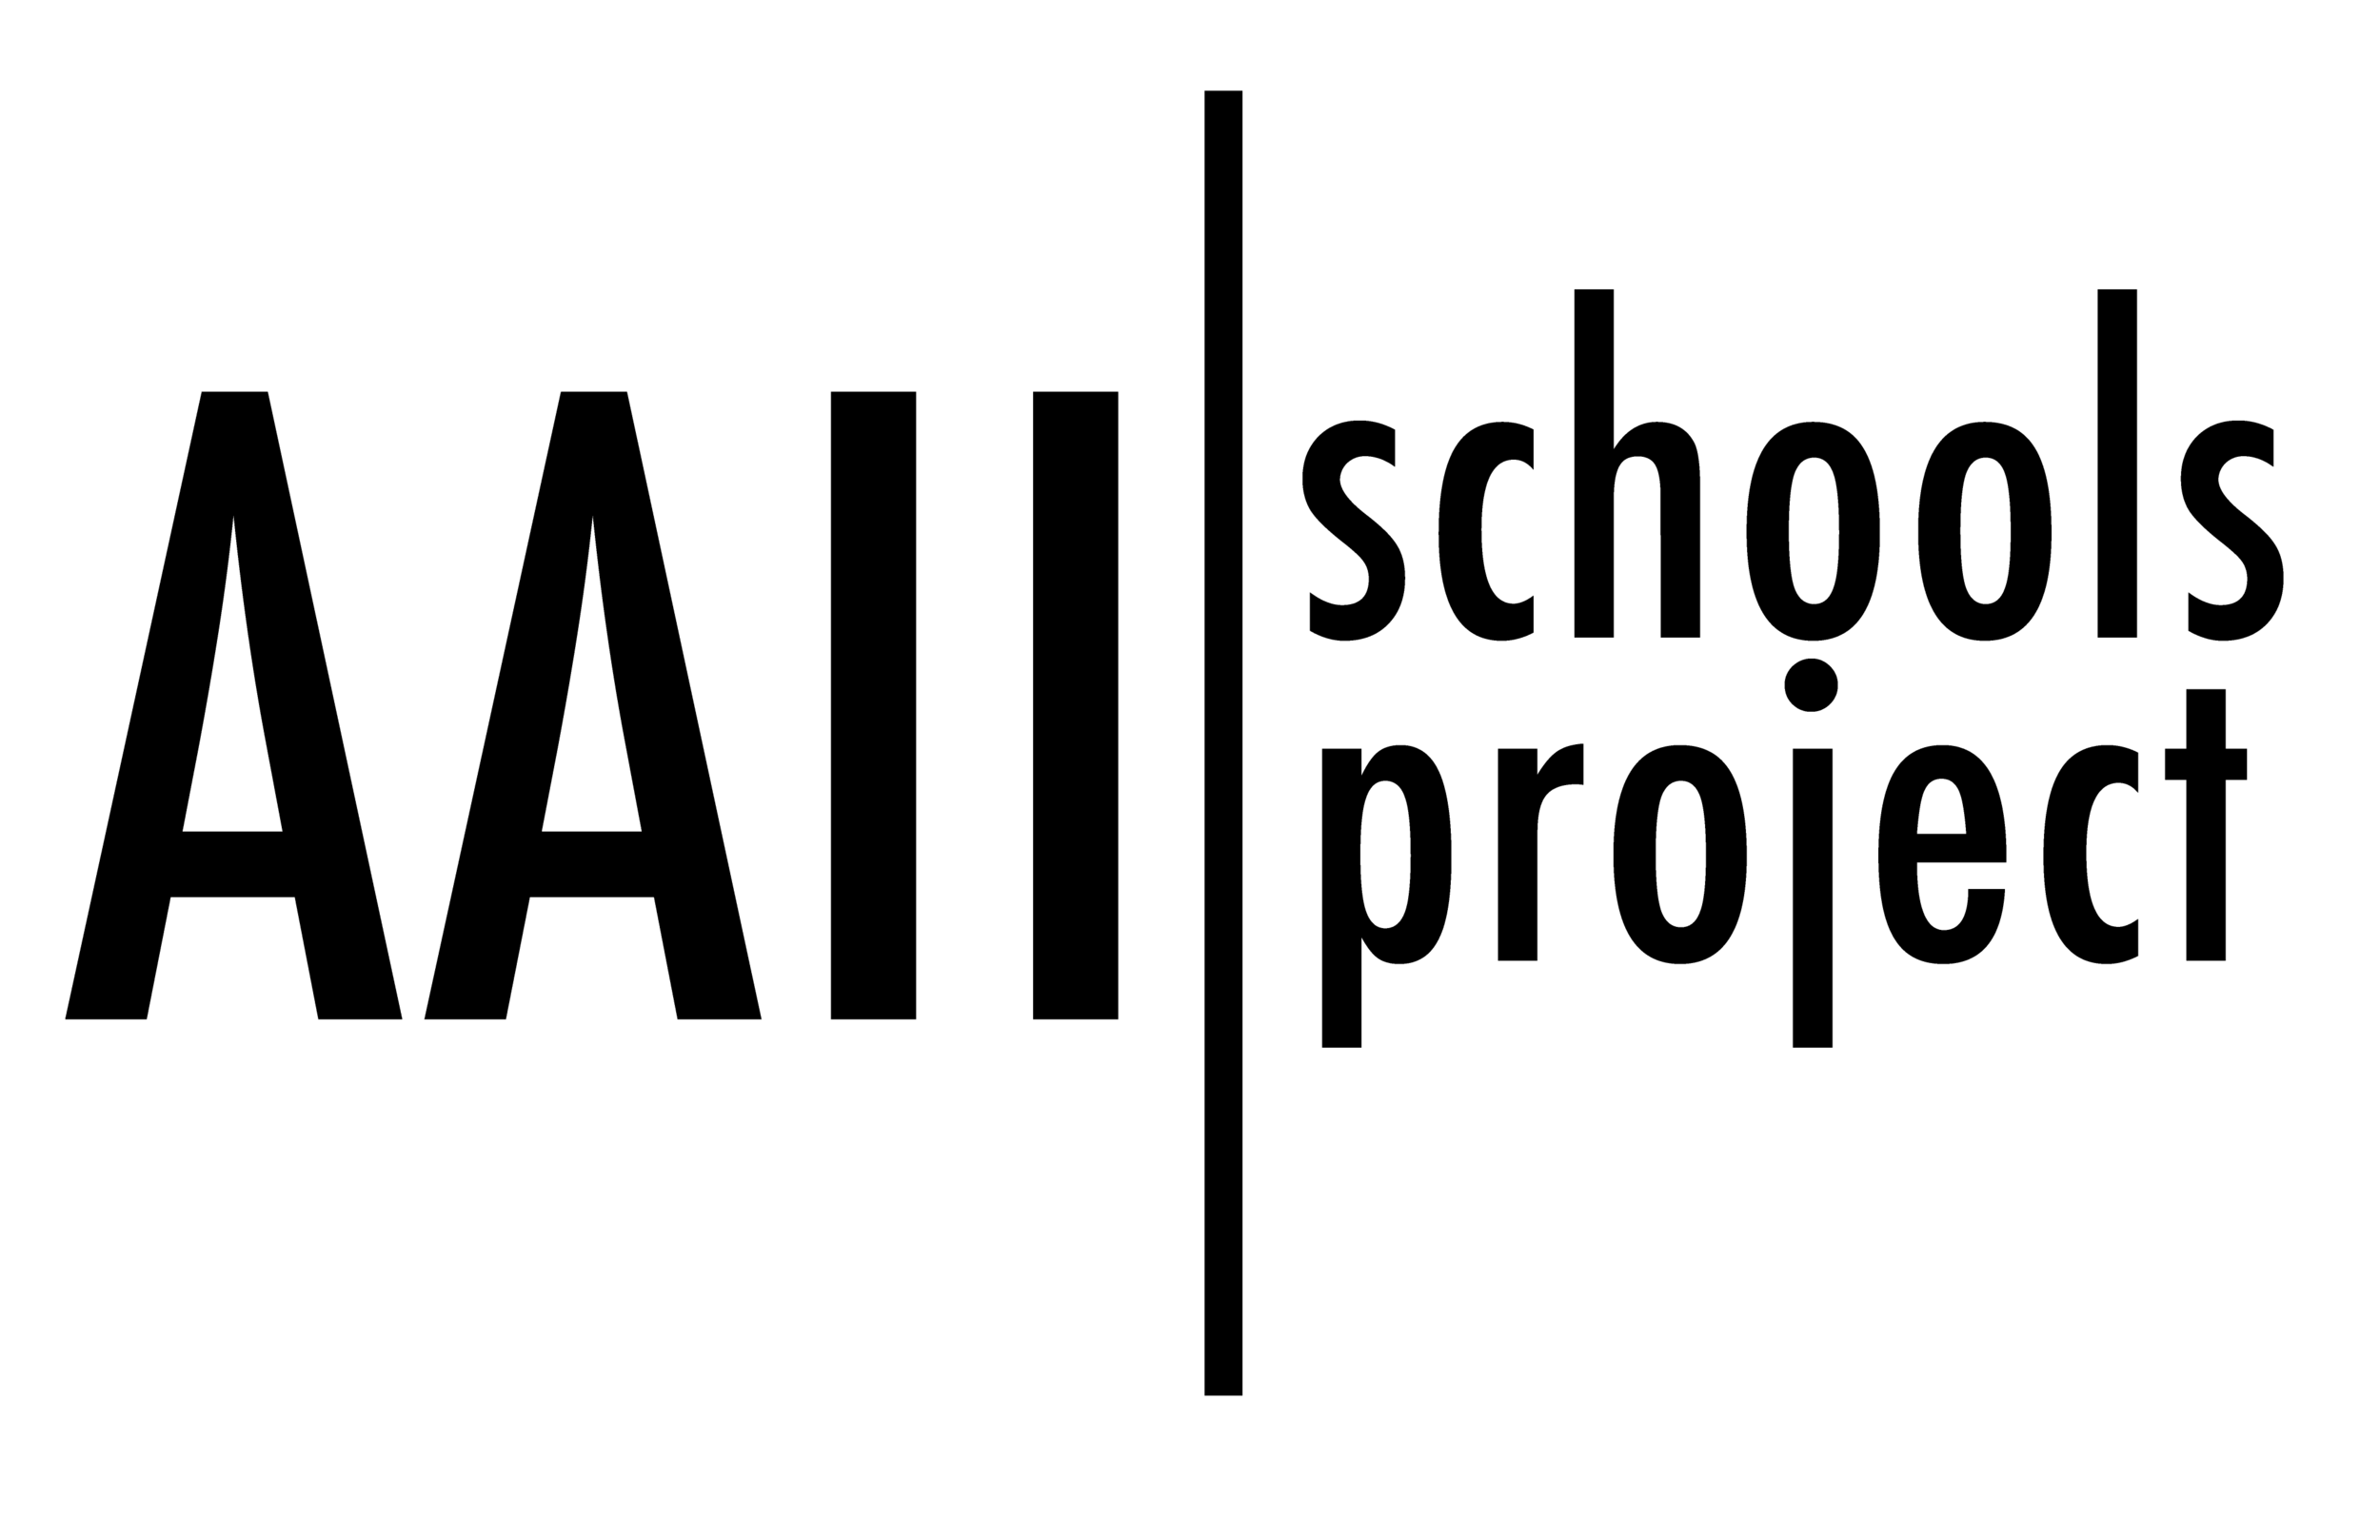 AAII-BLACK-LOGO.png